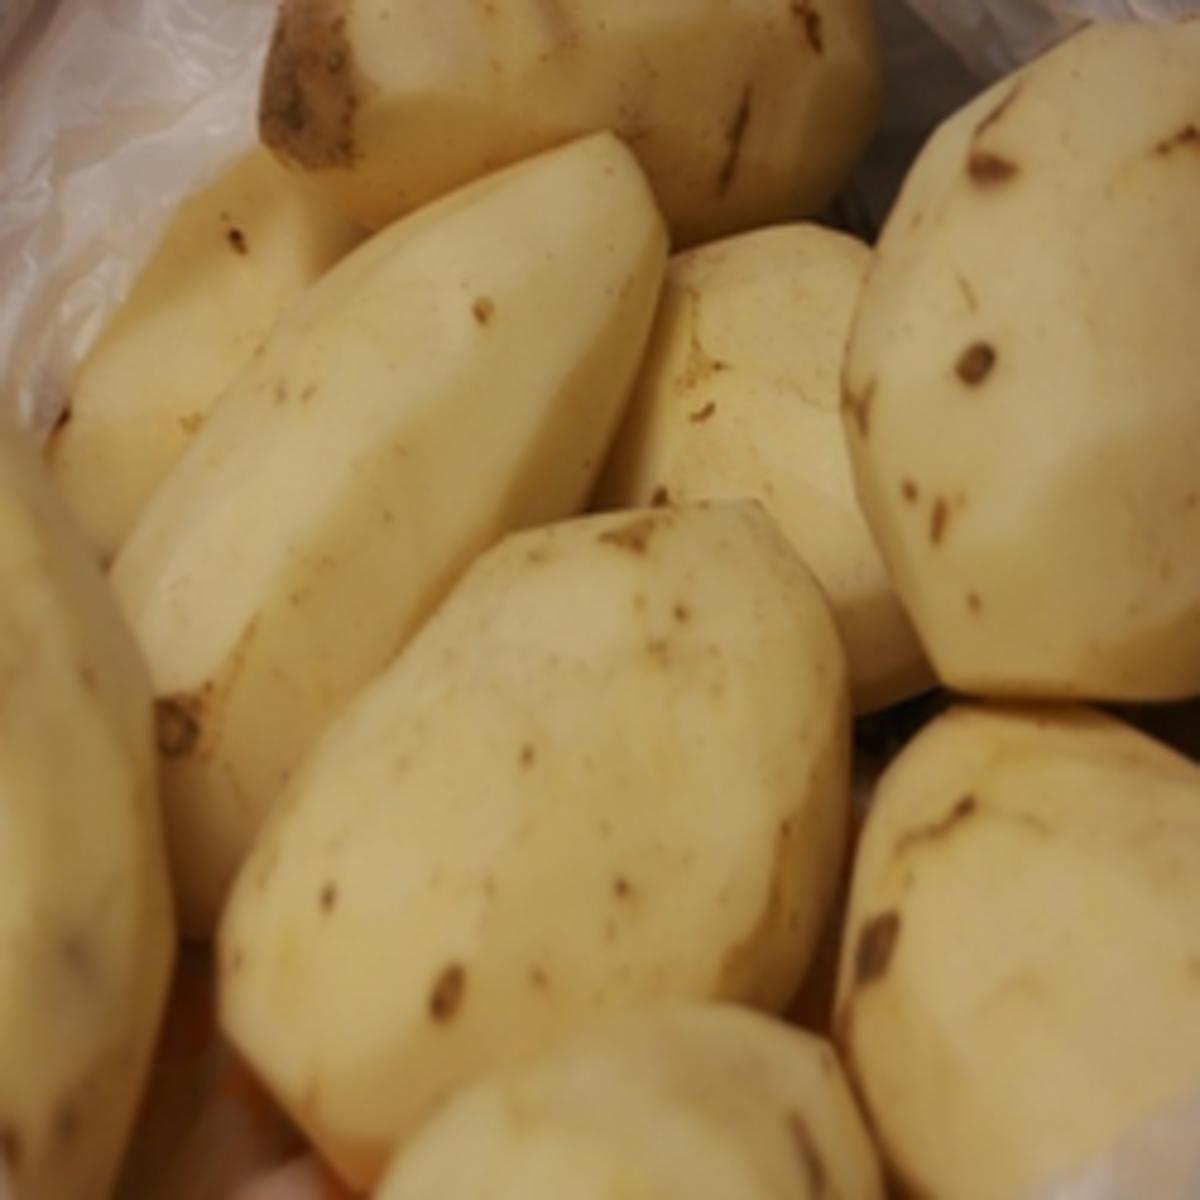 potato-peel-uses